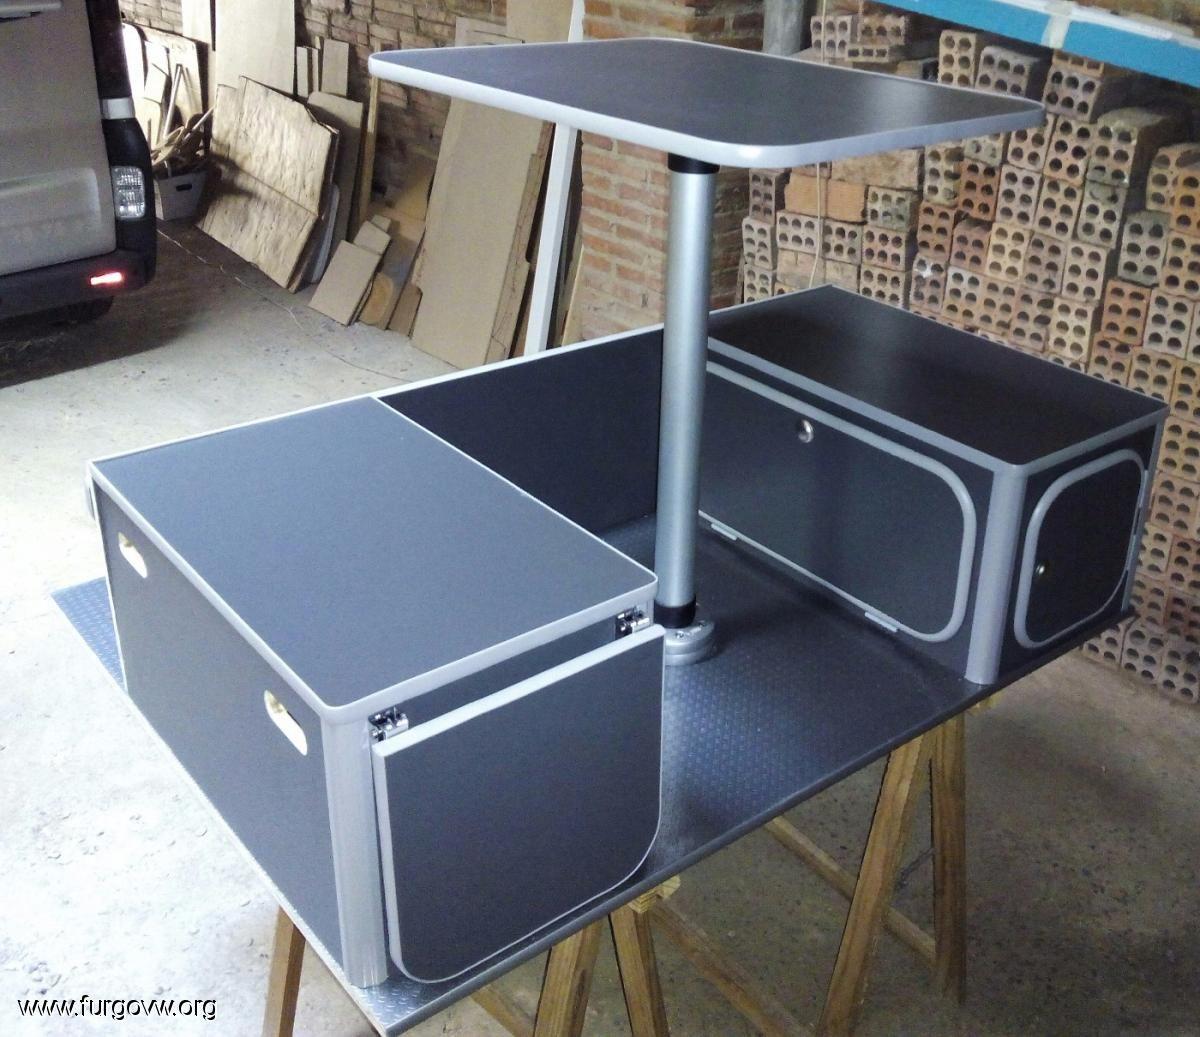 Mueble kit berlingo 2 partner c8 camper monovolumen campervan pinterest furgonetas - Muebles furgoneta camper ...